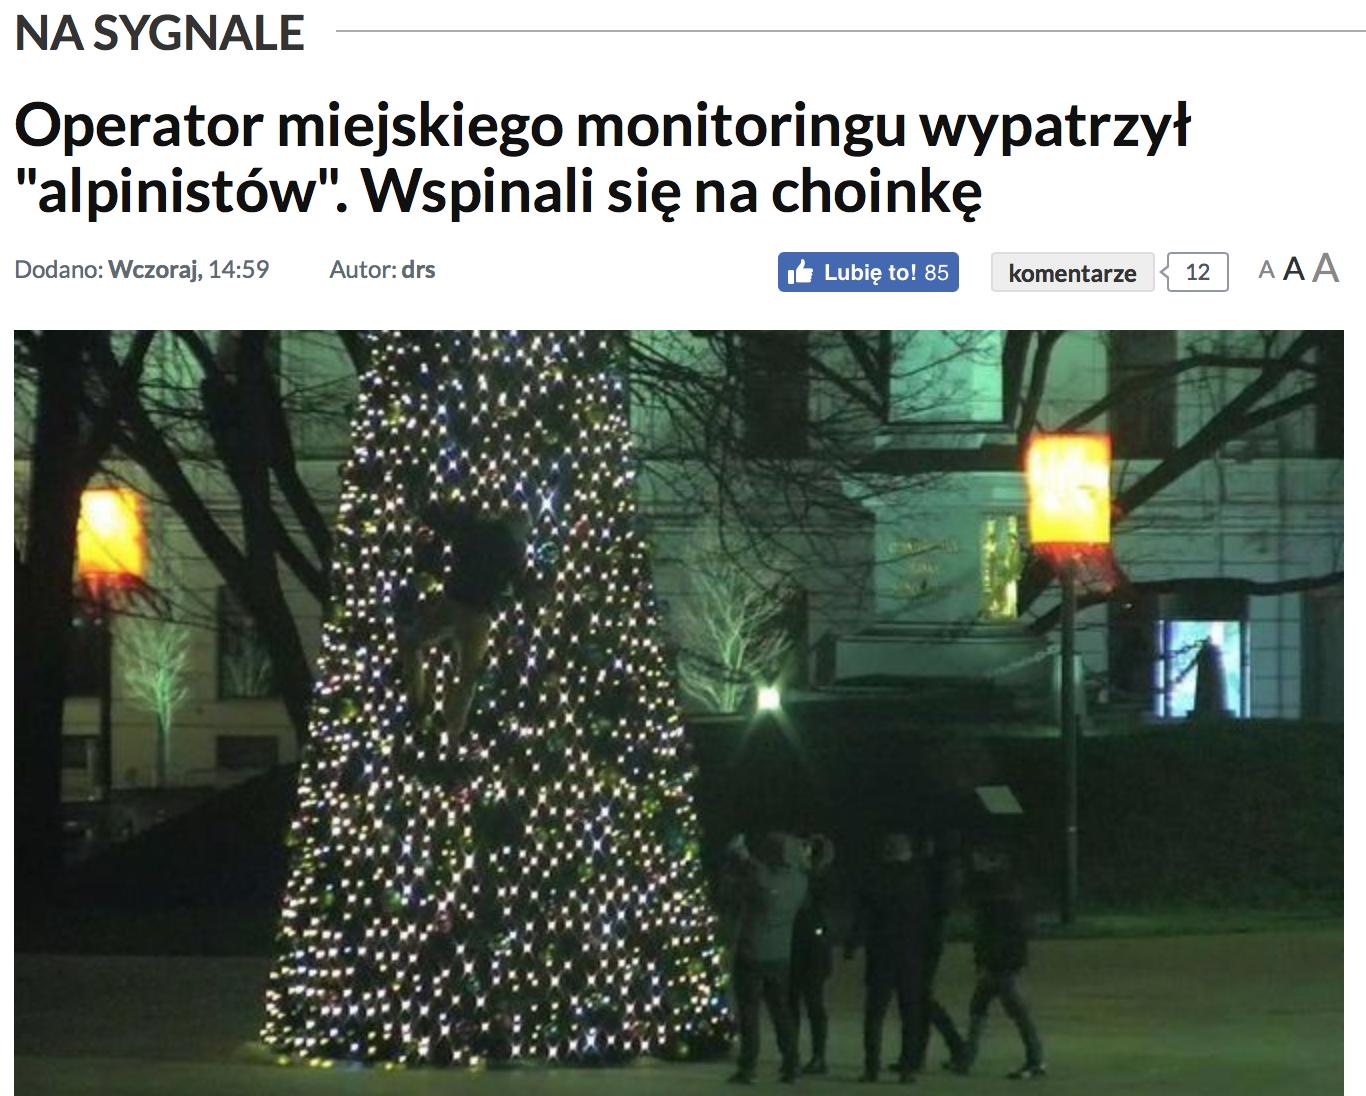 zrzut-ekranu-2017-12-12-o-21-58-04